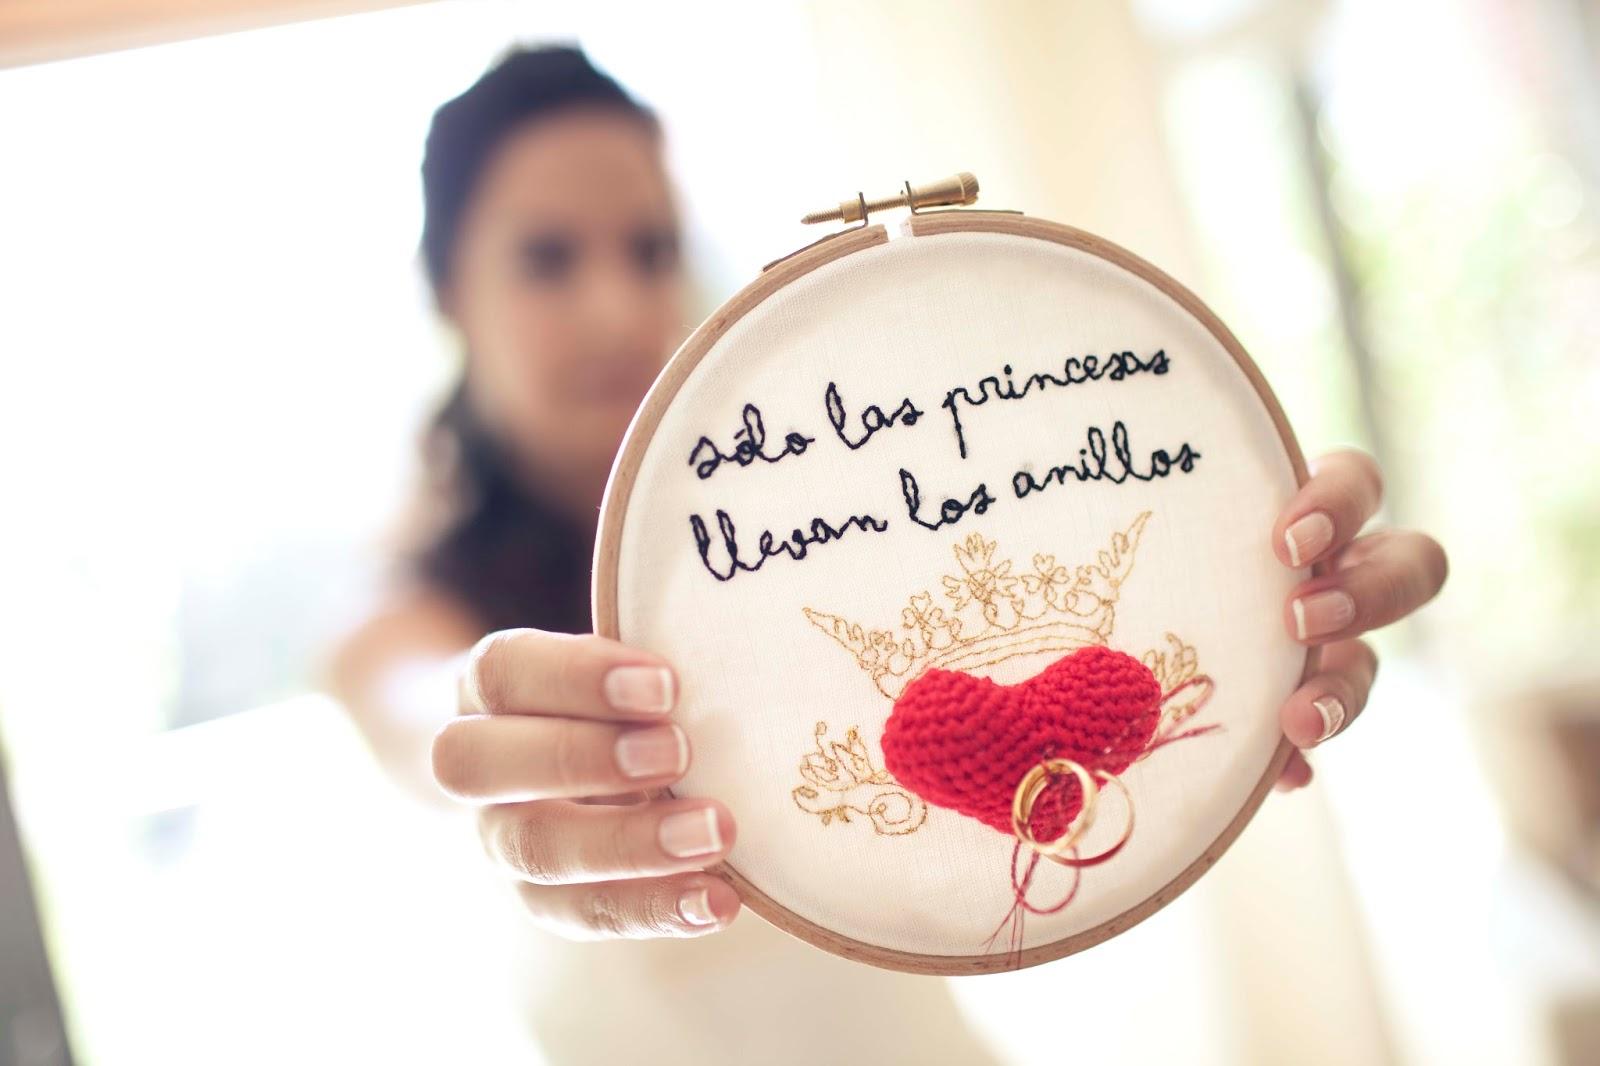 http://lluevediamantina.blogspot.com/2014/04/inspiracion-bastidores-bordados-para.html